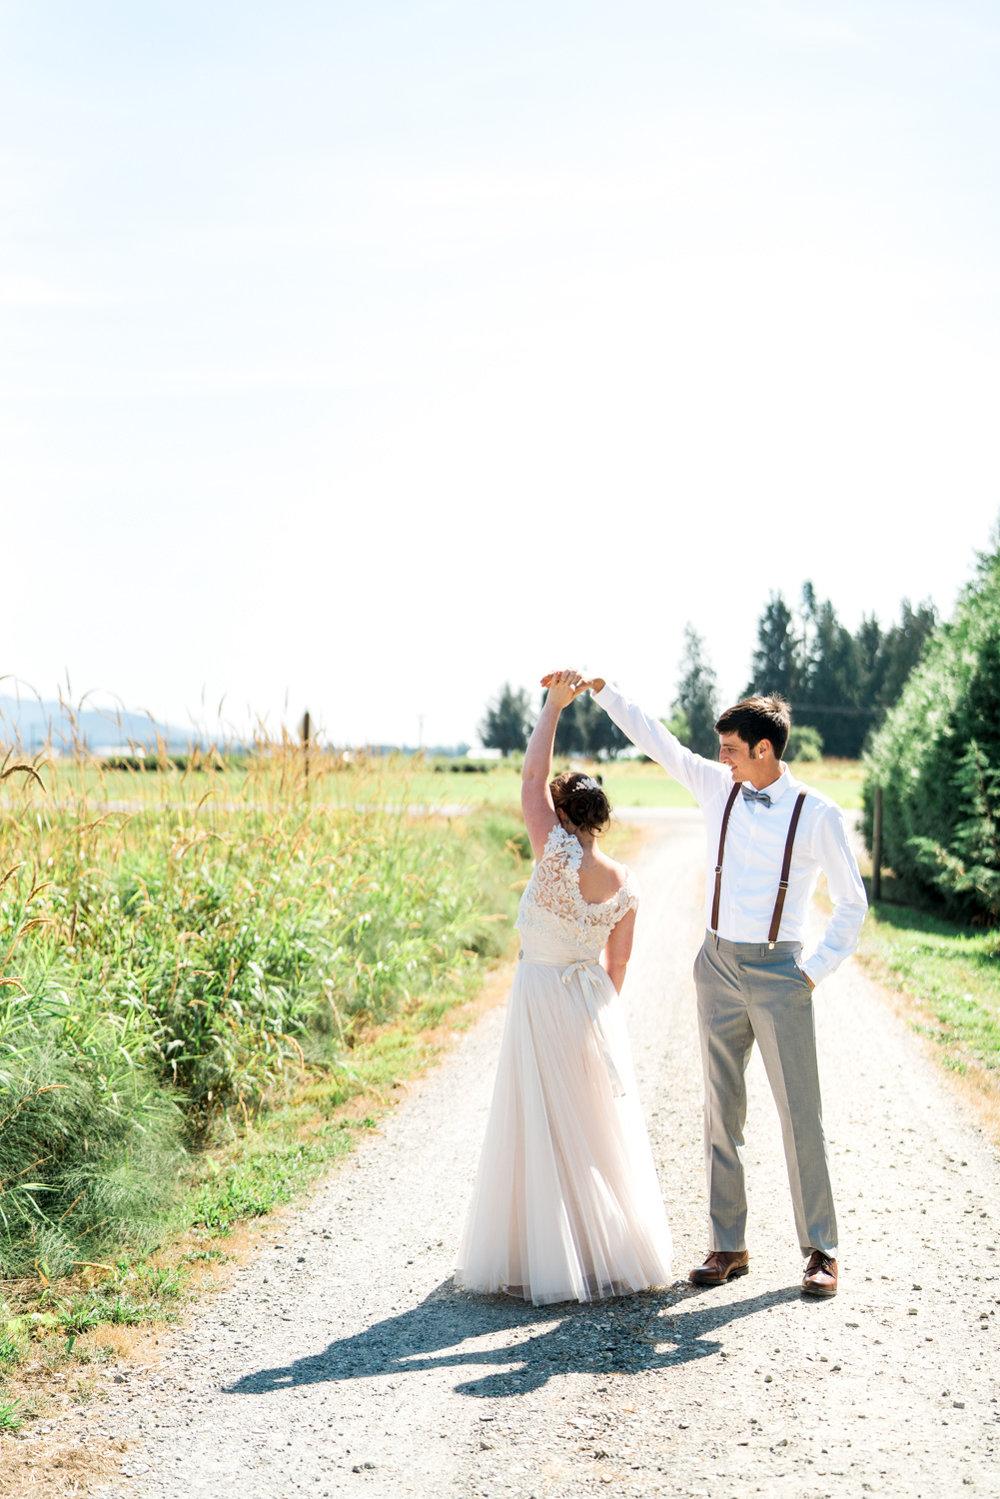 April Yentas Photography - Hannah & Ian-26.jpg